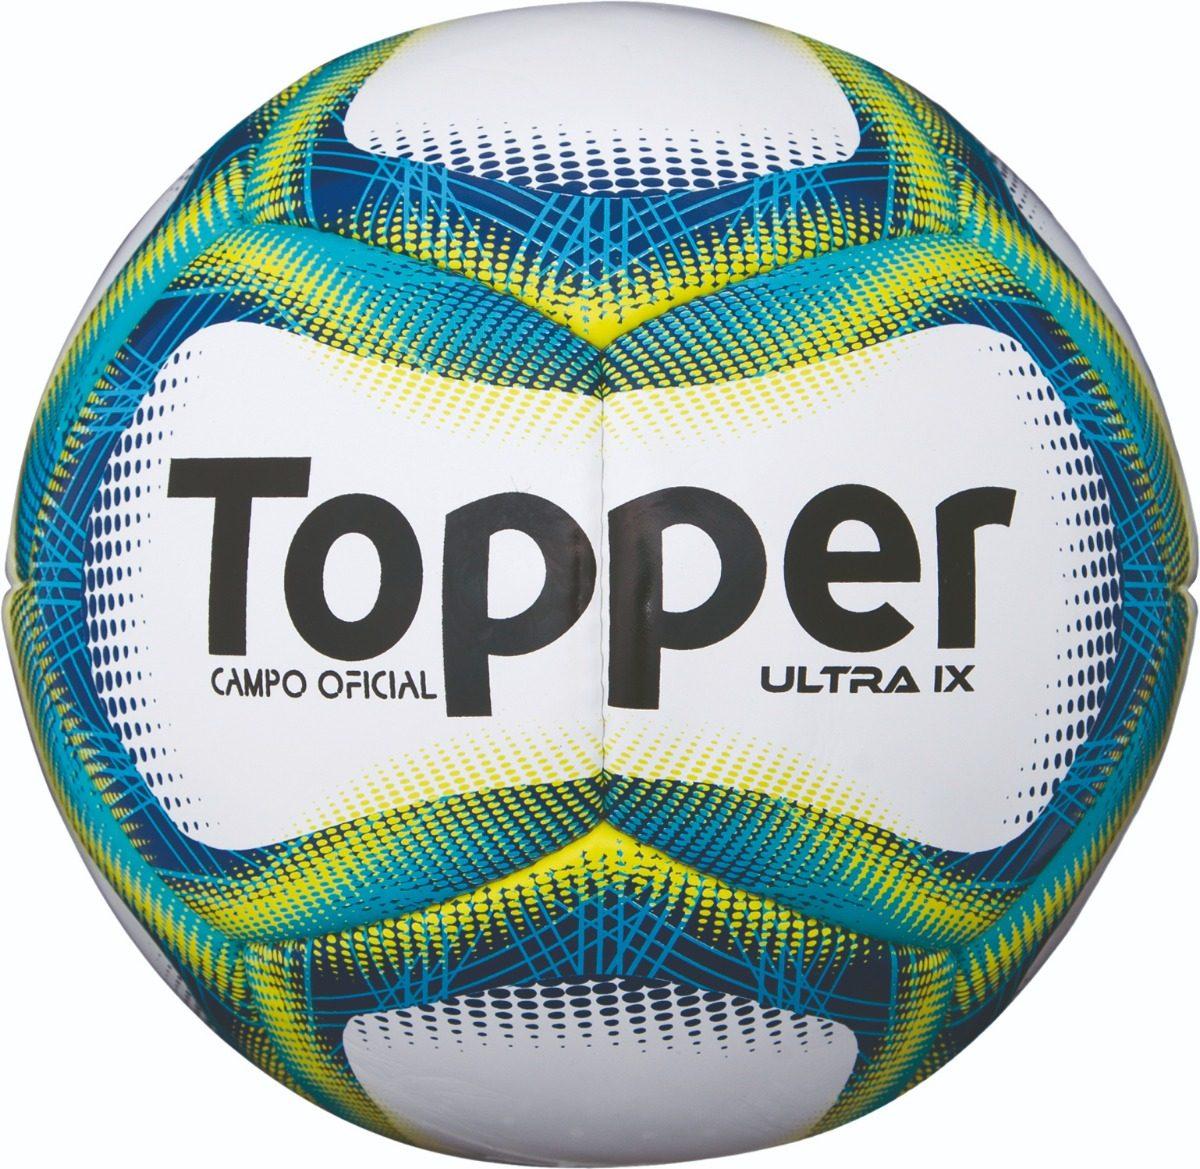 Bola Fut Campo Topper Ultra Ix - Costurada Á Mão - R  120 d7c3968cad9a2